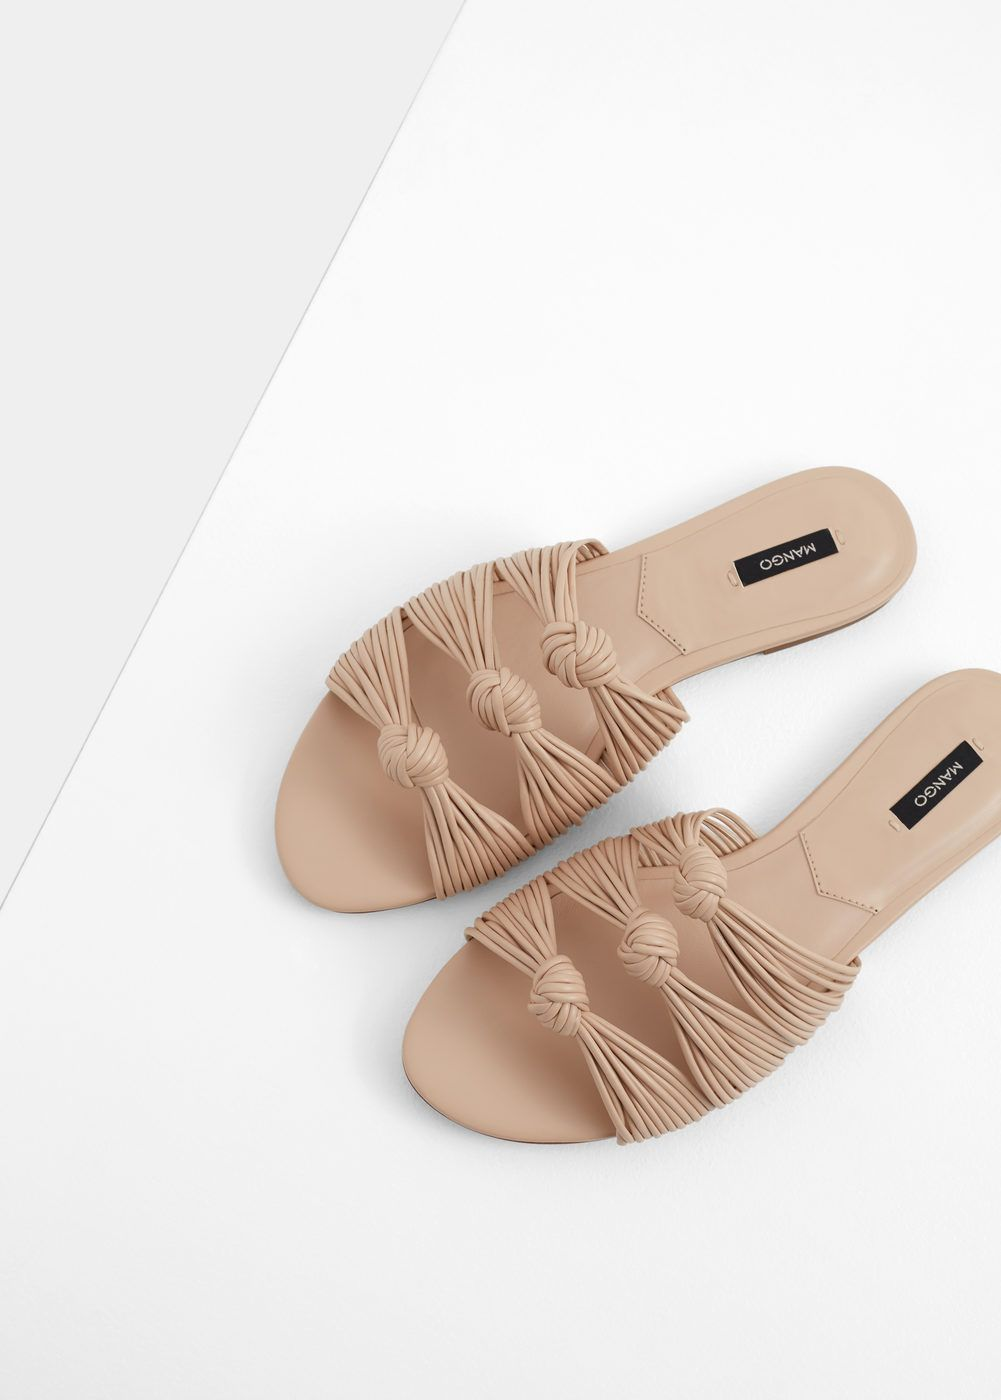 Flat Planas WomenIt's MineSoonSandalias Sandals Knots GpzMqSUVL